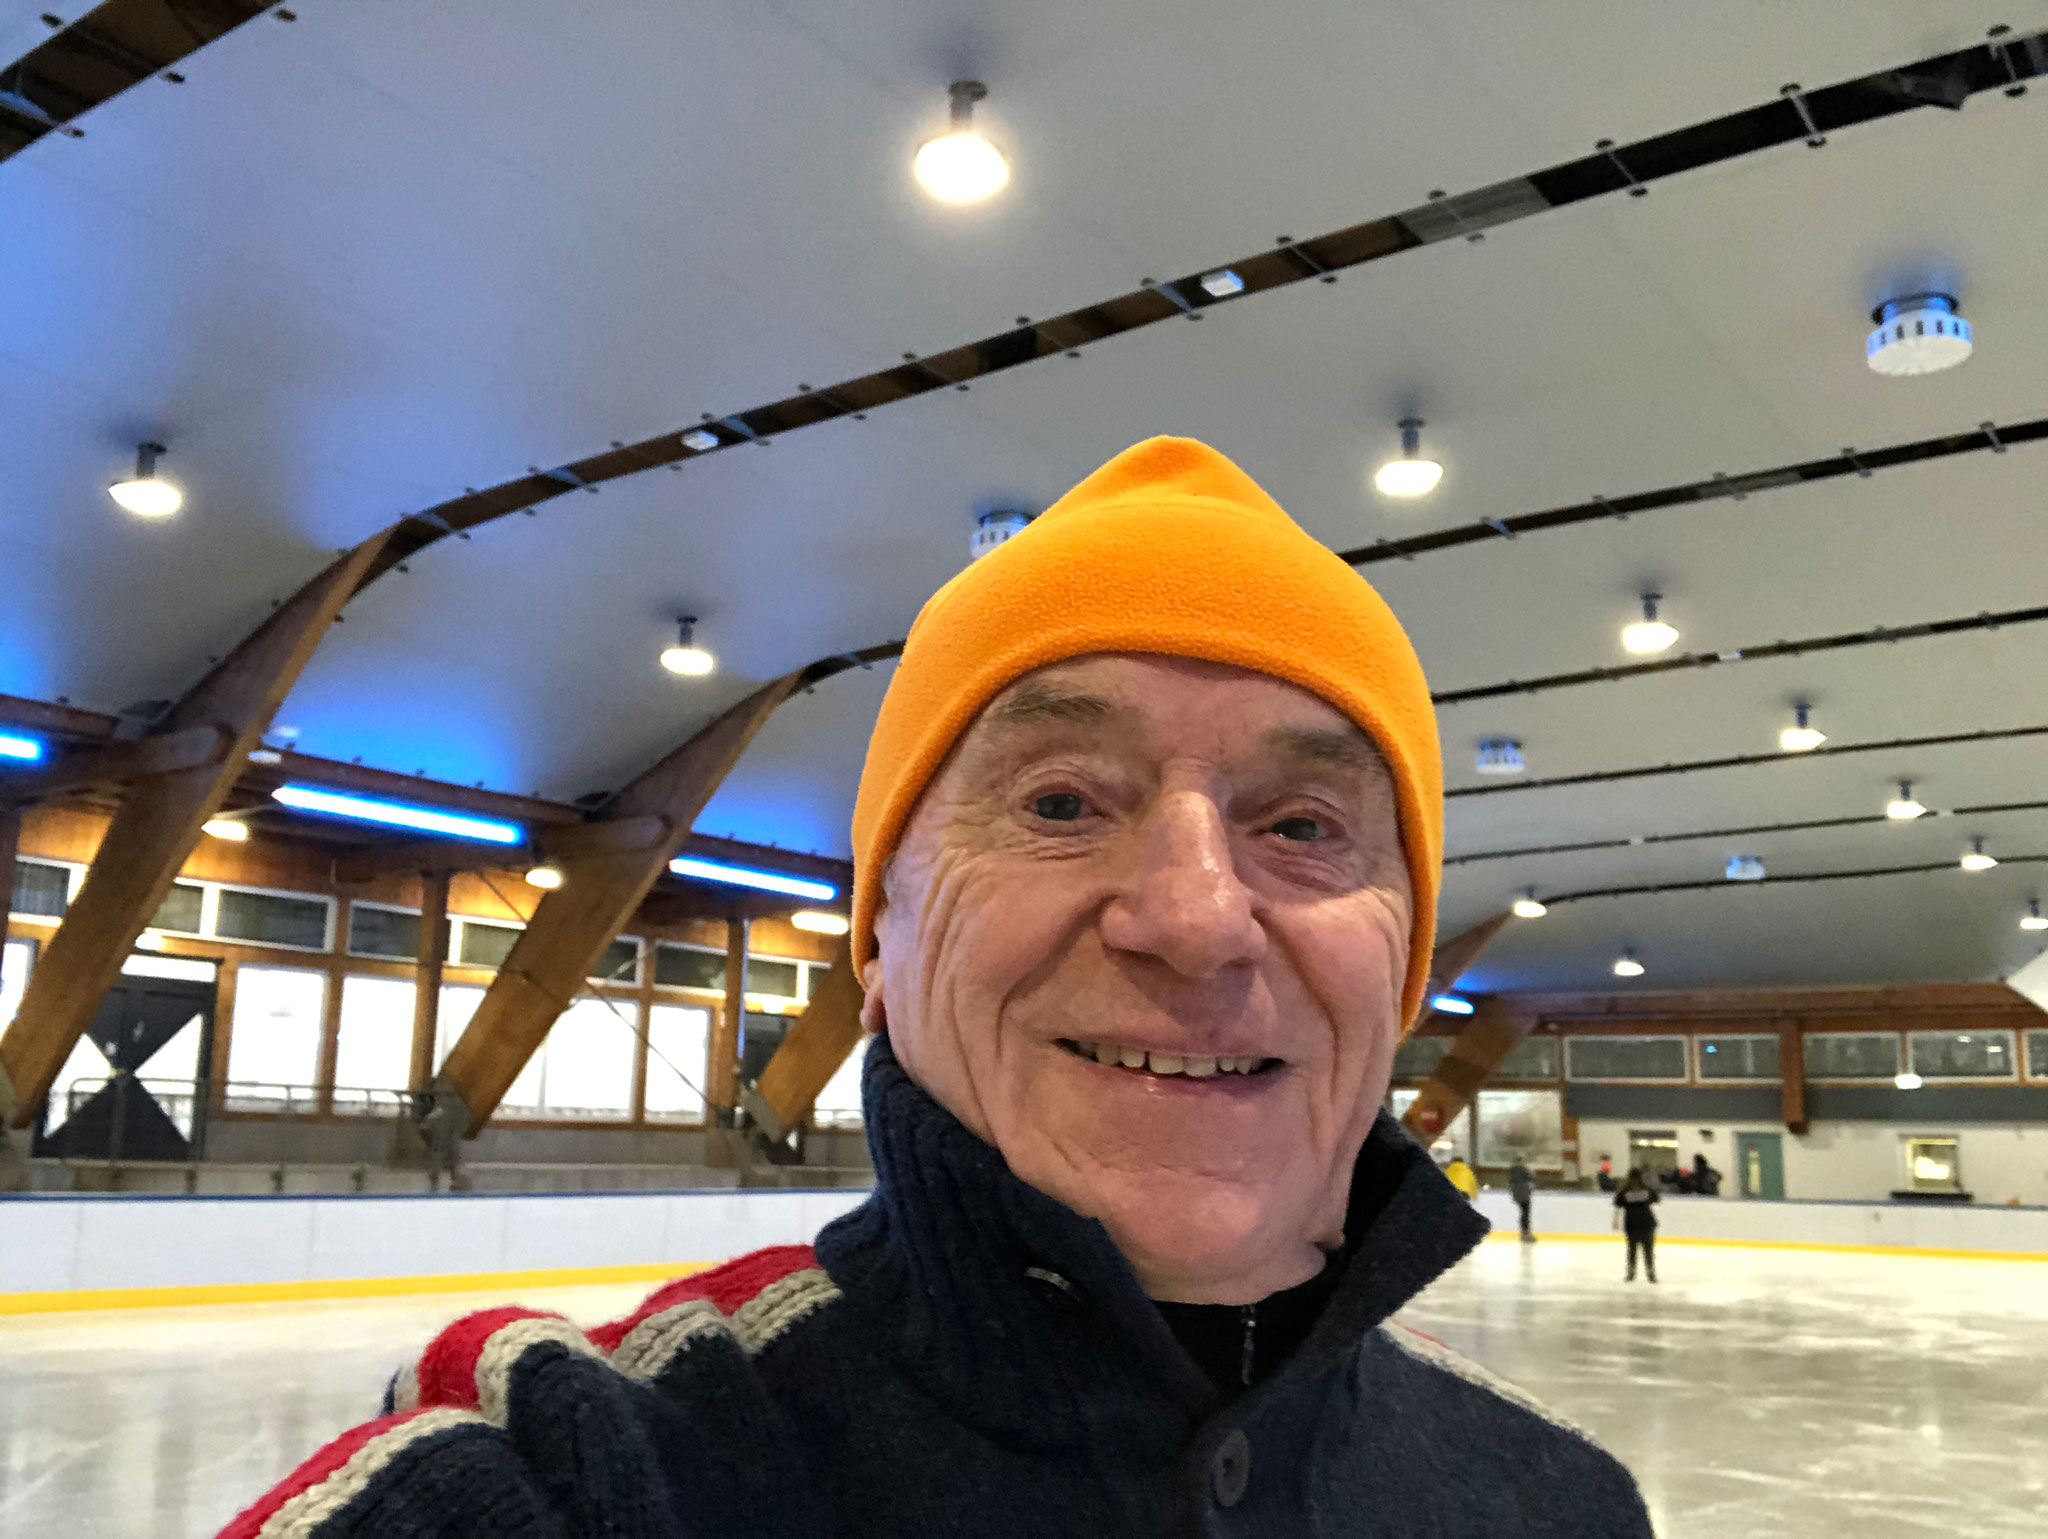 2020 neue Eislaufhalle in Baiersbronn